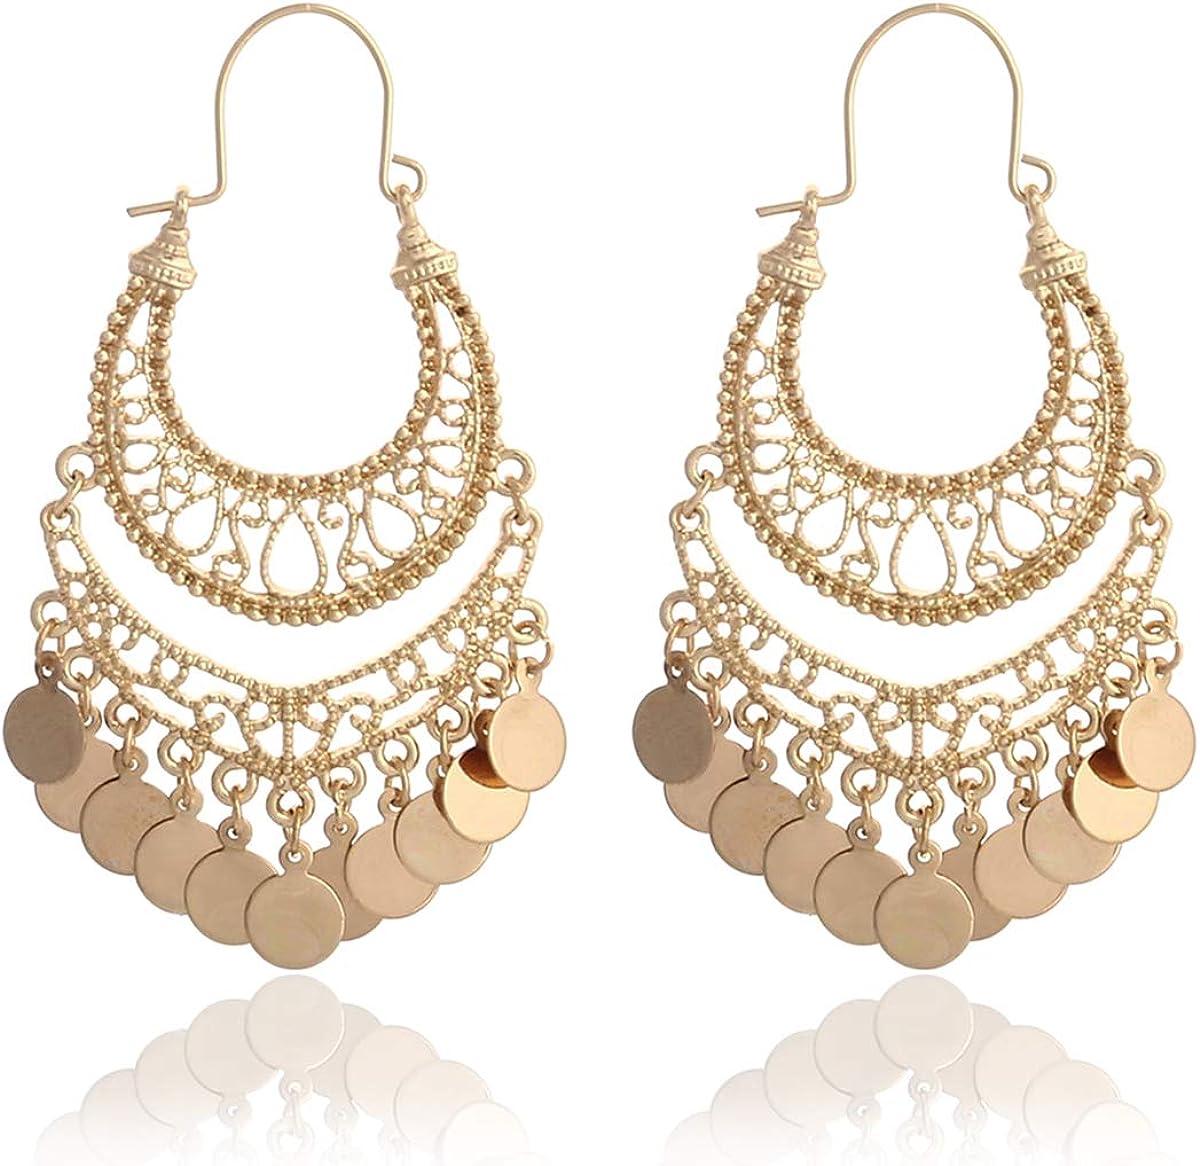 Boho Glam dramatic dressy light weight matte gold metal rod dangle drop pierced earrings wgraduating gold faceted drop beads /& ear wires